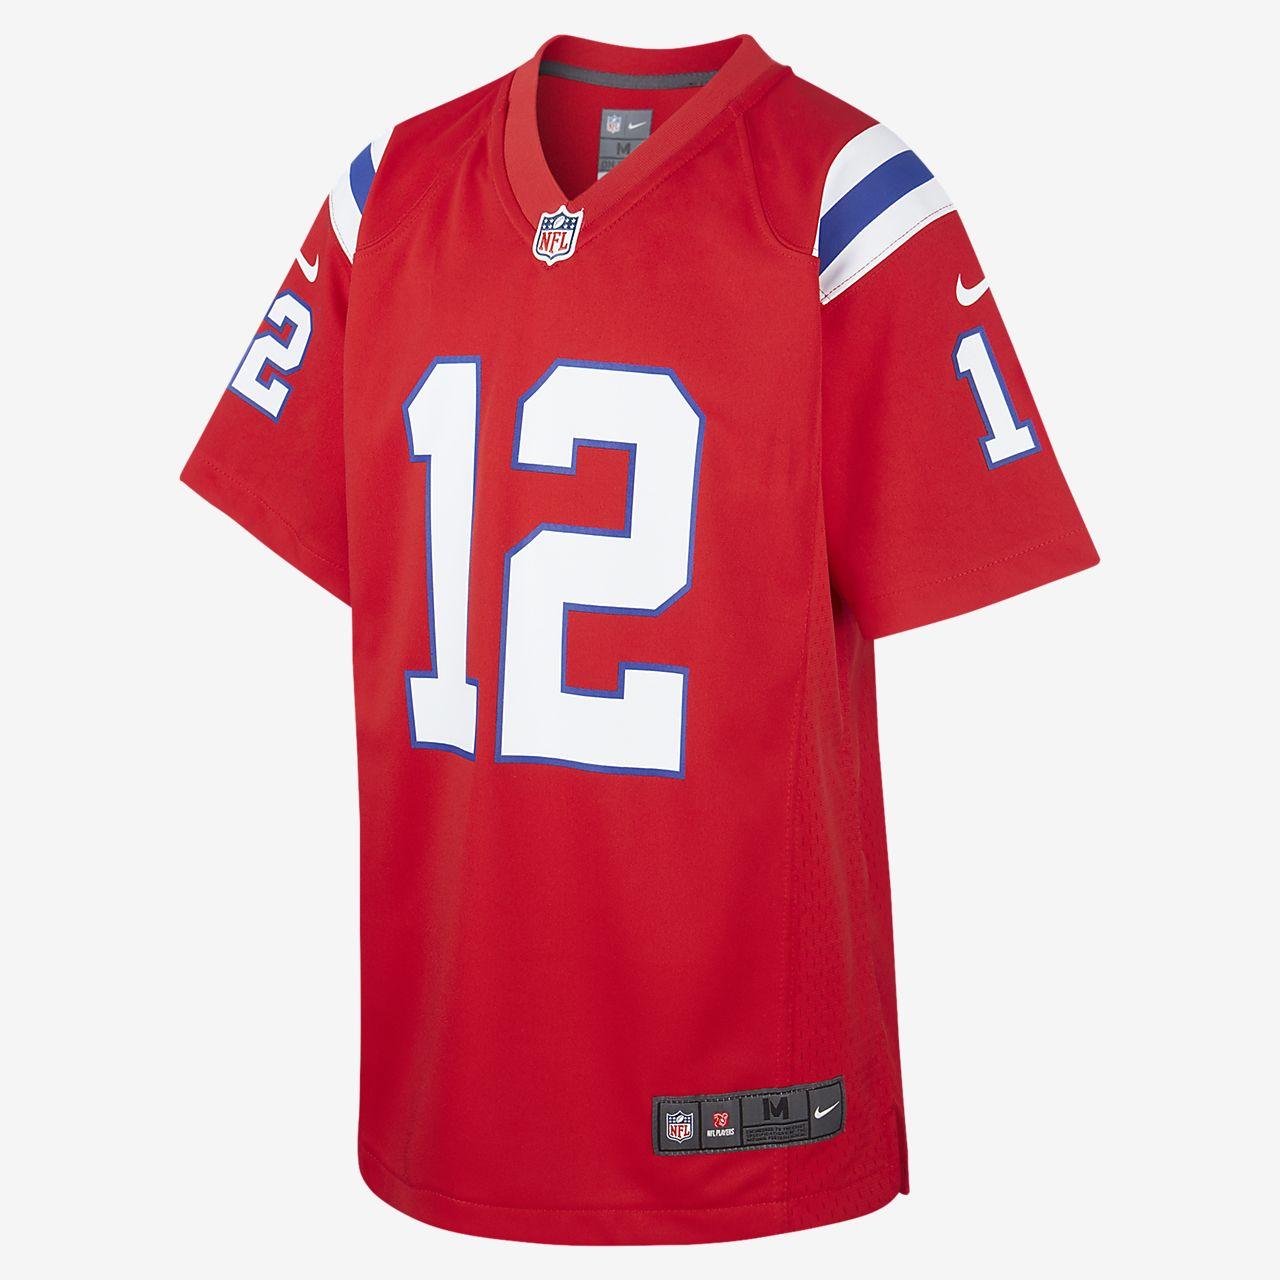 Spelartröja NFL New England Patriots (Tom Brady) för ungdom